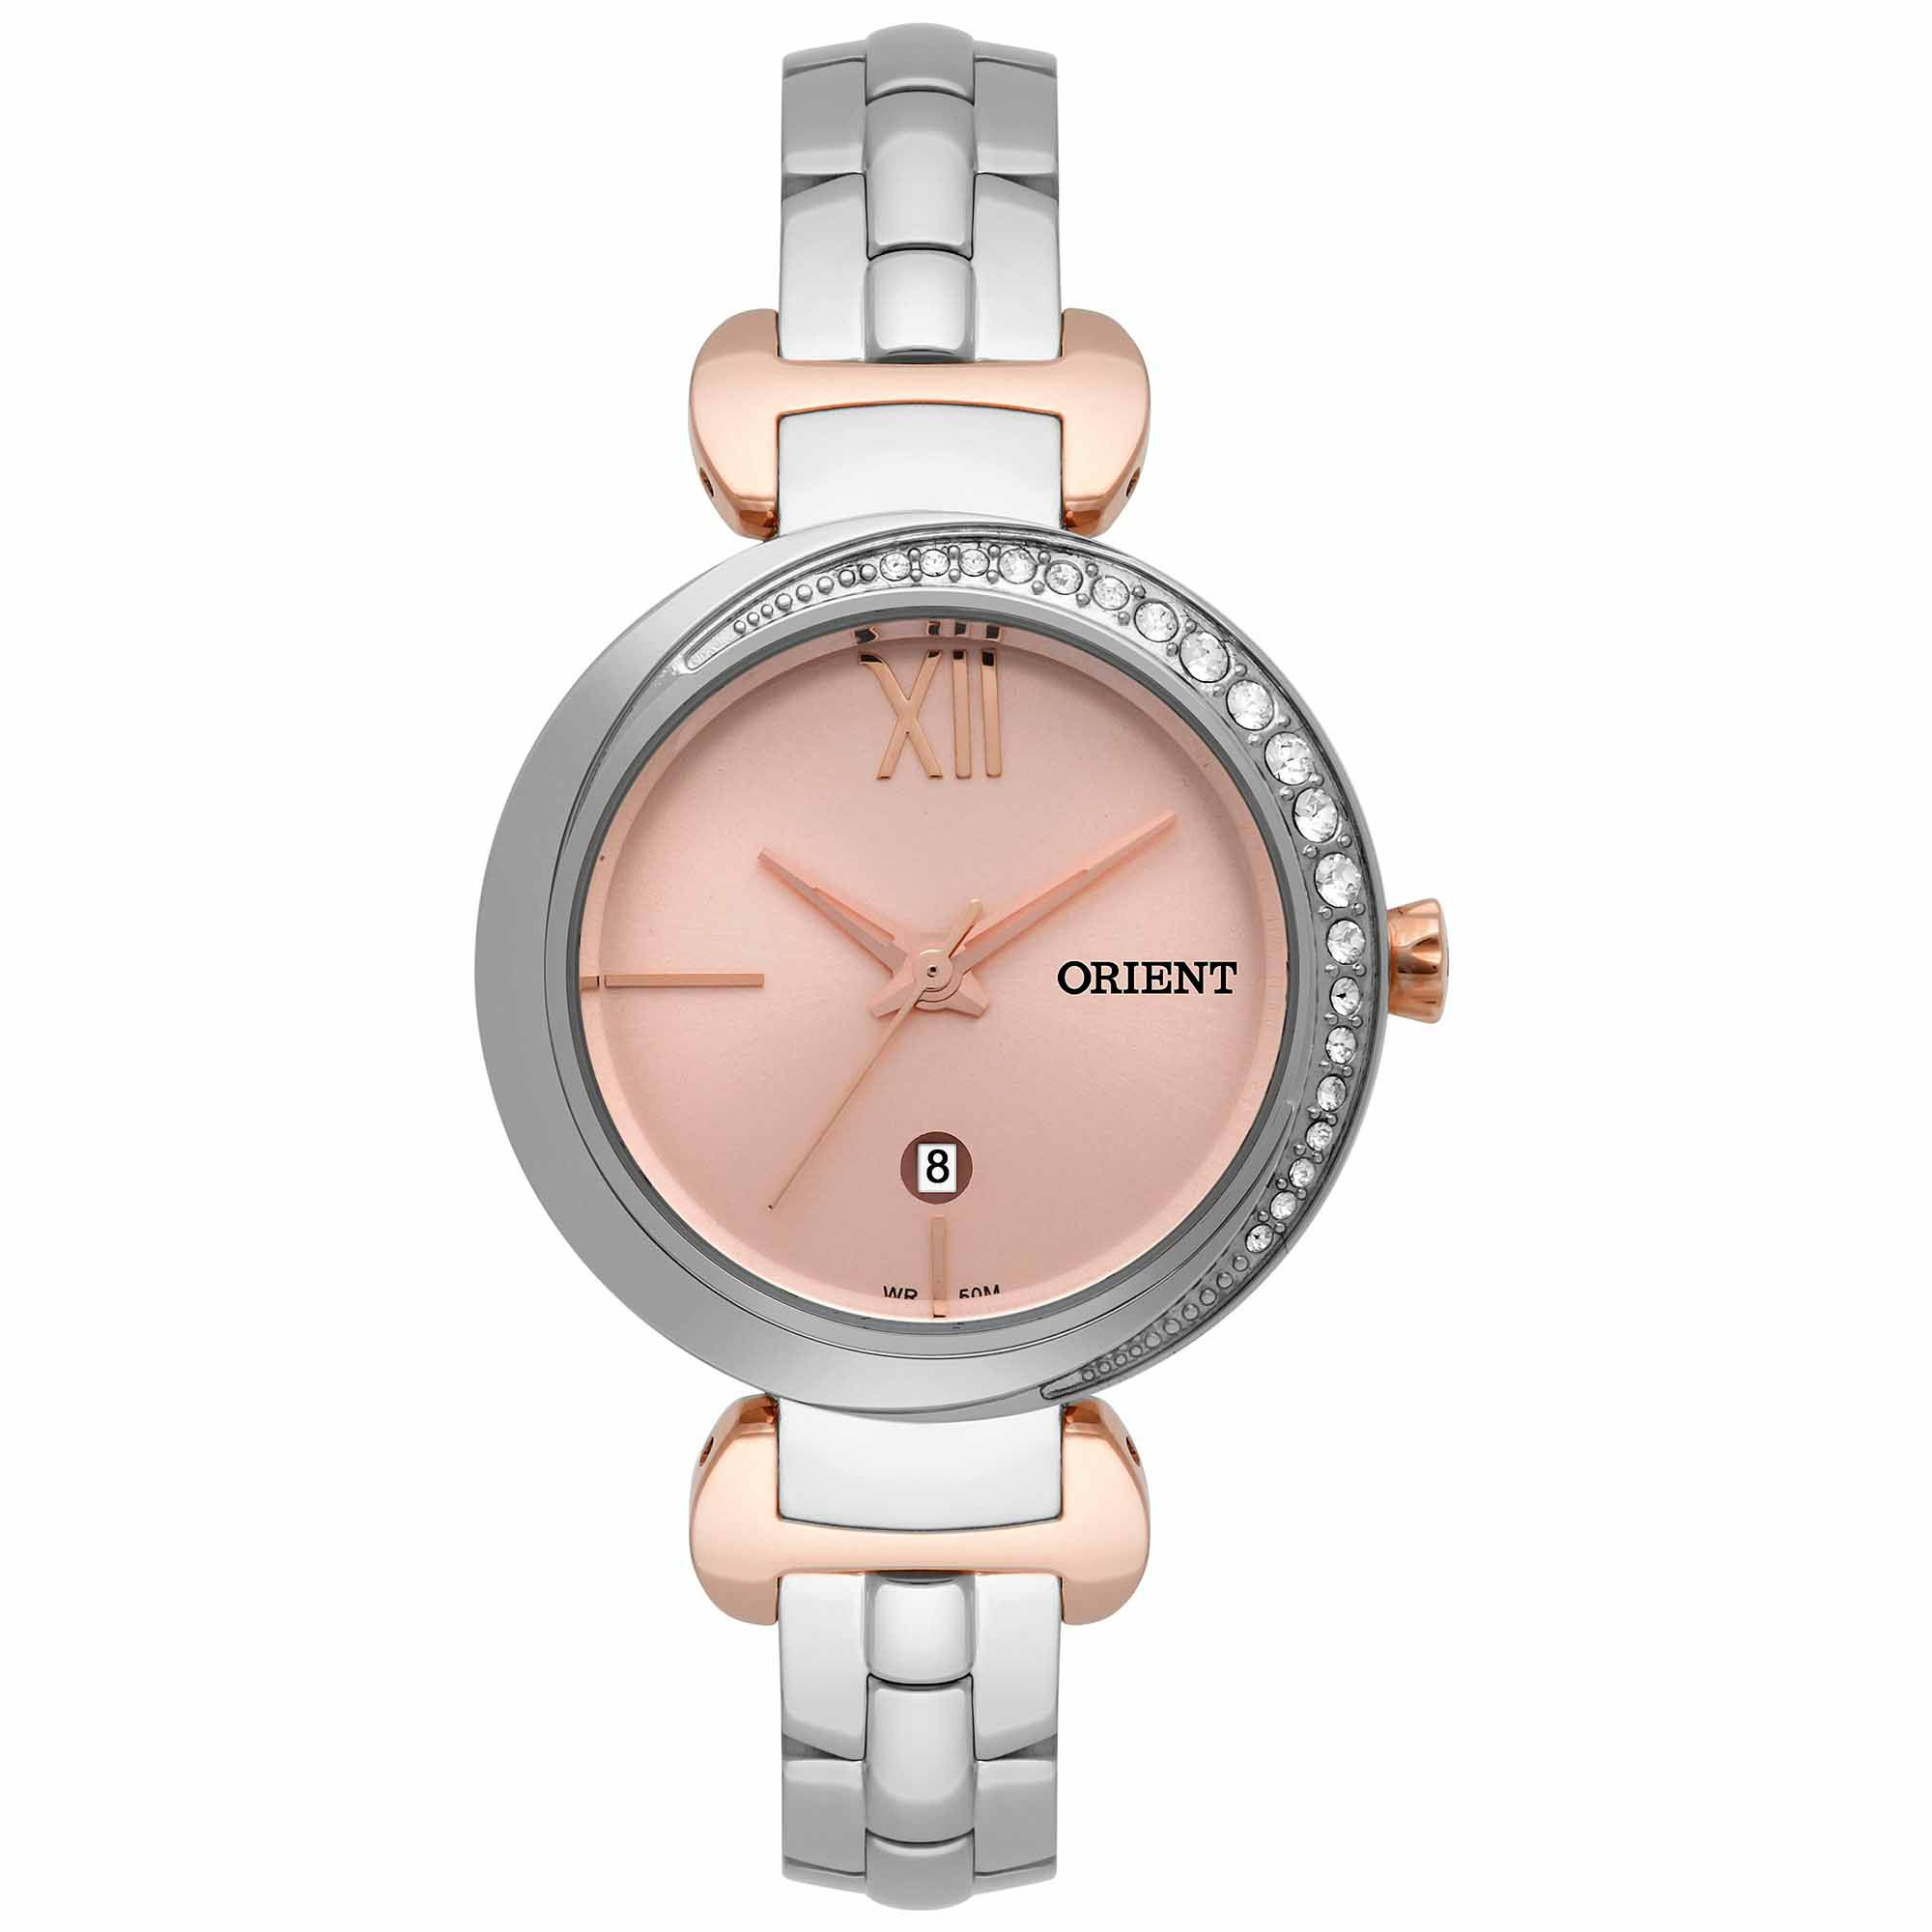 Relógio Feminino Orient FTSS1122 R3SR